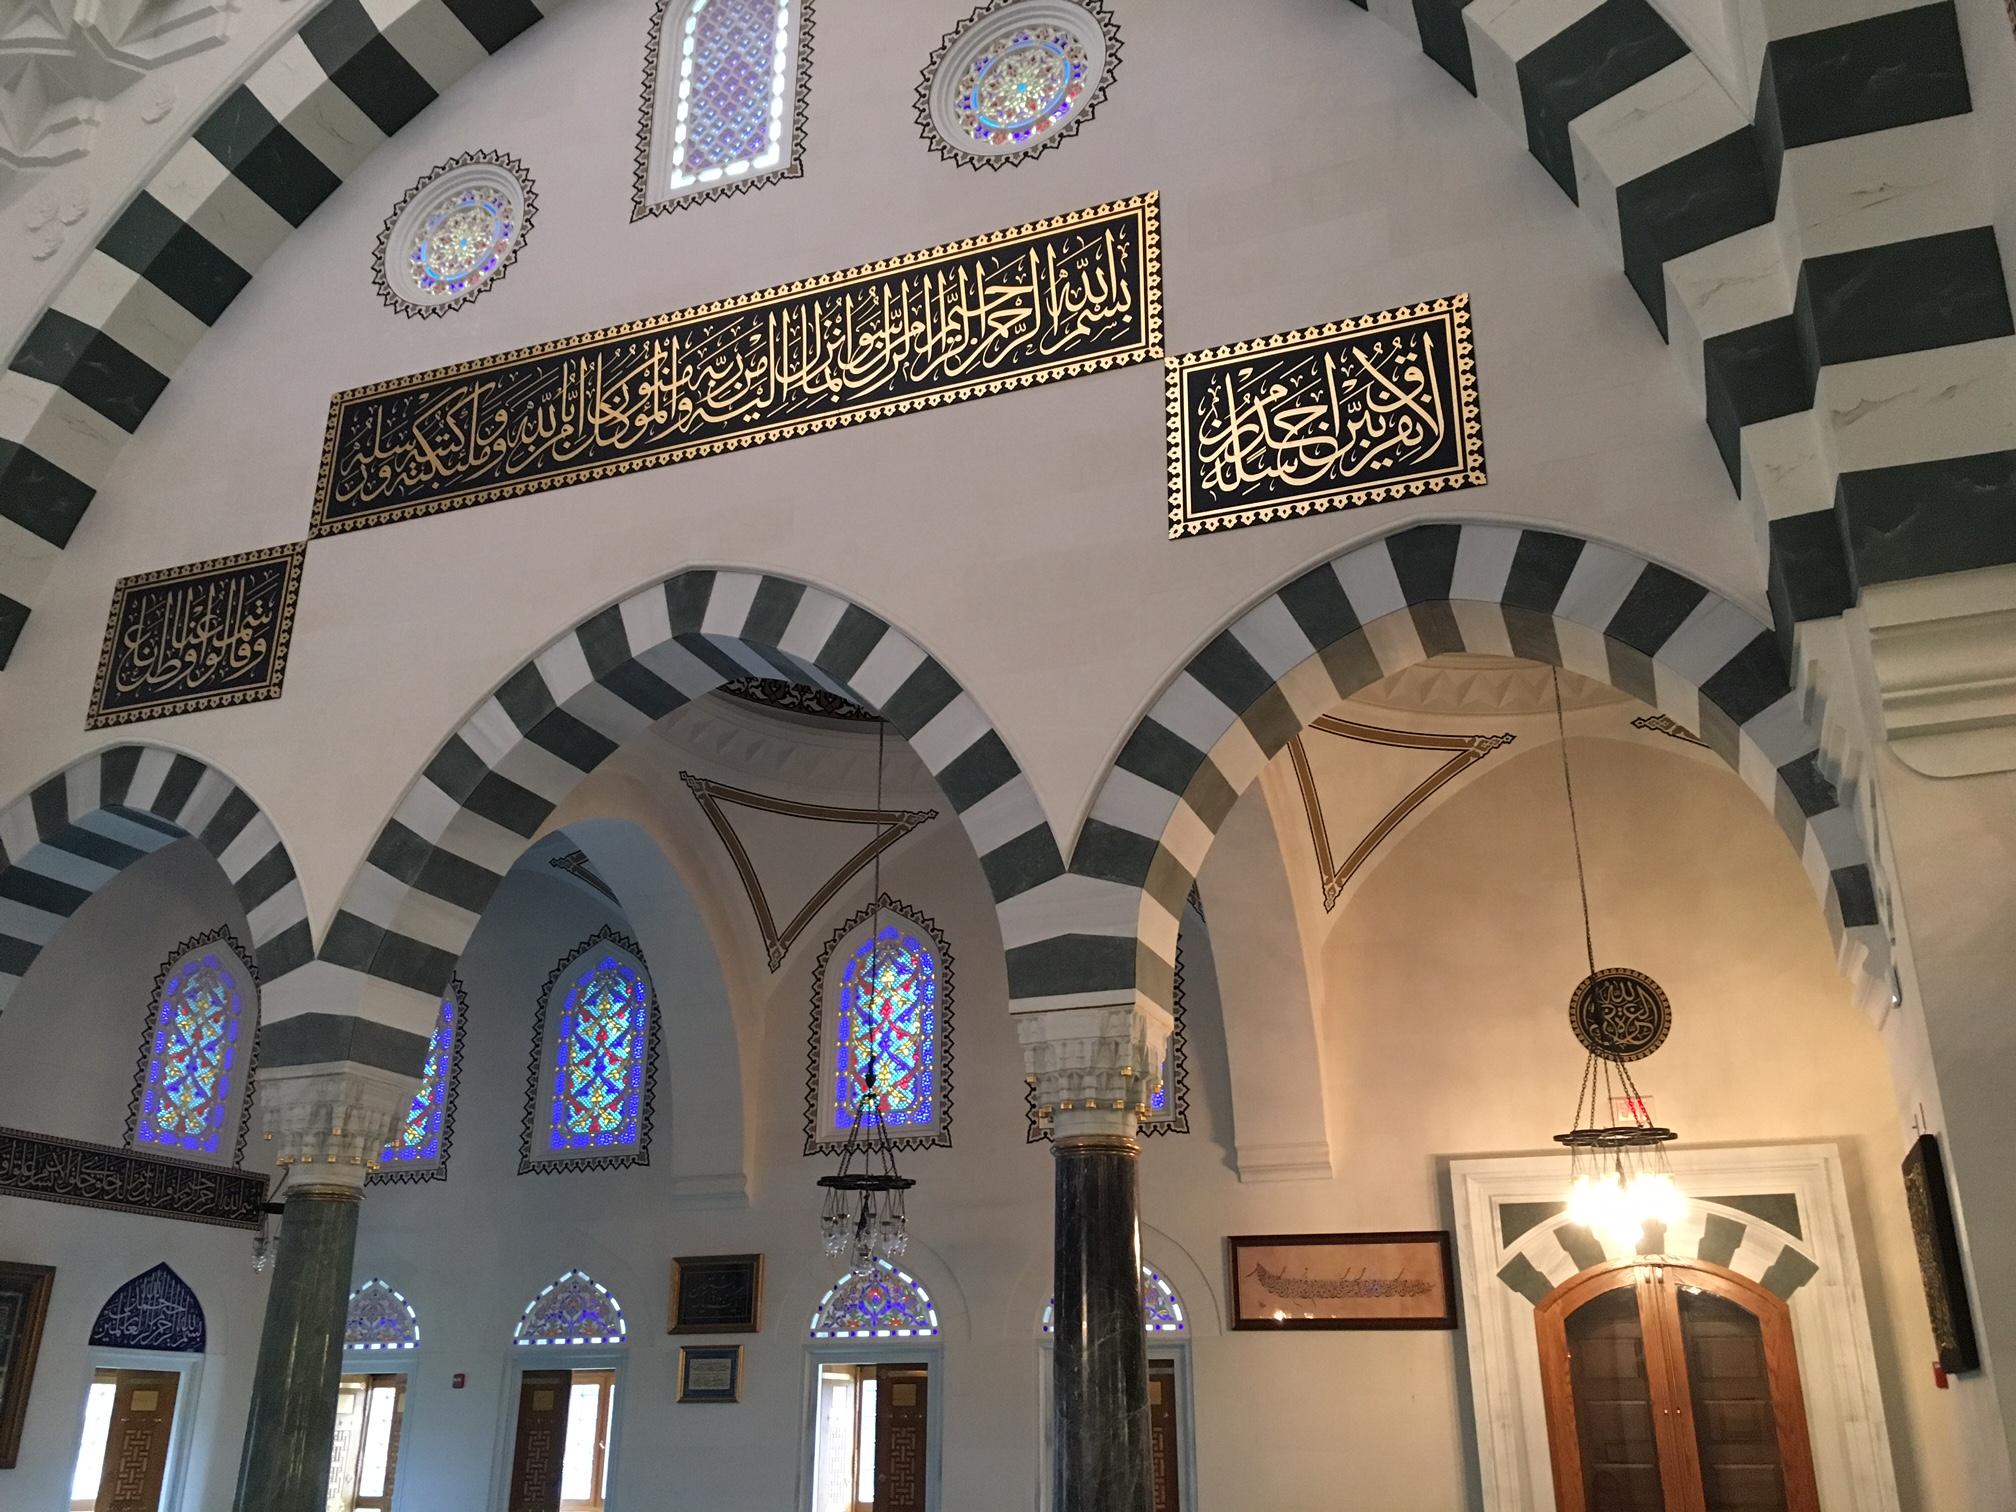 An Open-Door Policy to Combat Islamophobia